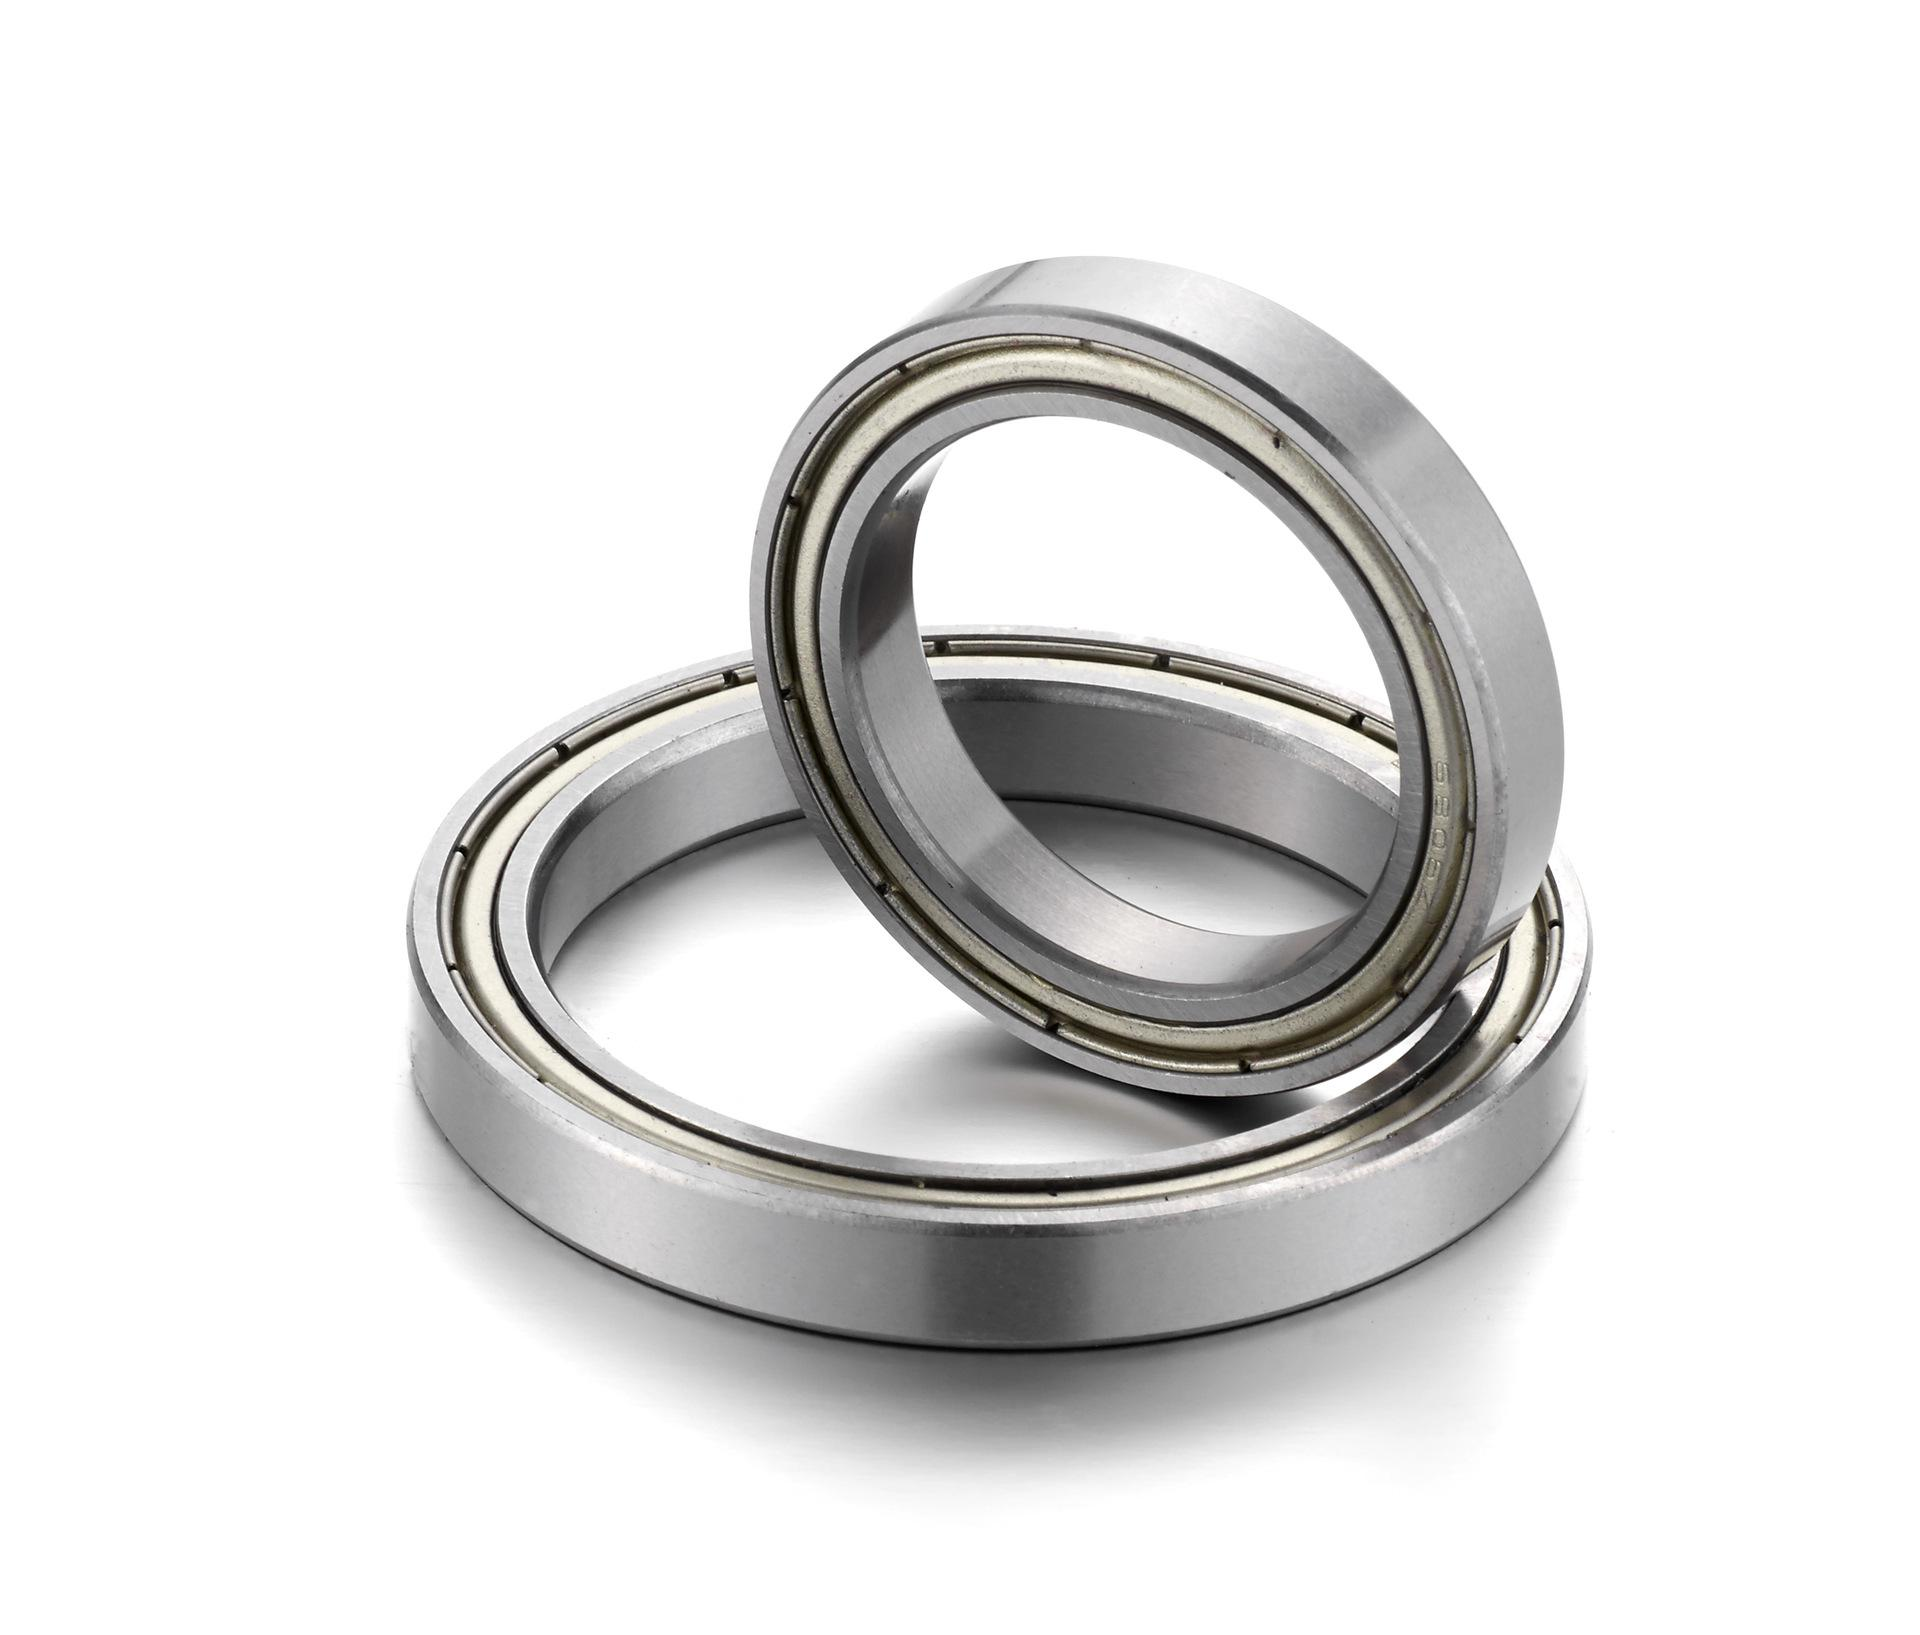 6918 ZZ ABEC-1  90x125x18mm  Metric Thin Section Bearings 61918ZZ 6918ZZ 1pcs 71901 71901cd p4 7901 12x24x6 mochu thin walled miniature angular contact bearings speed spindle bearings cnc abec 7